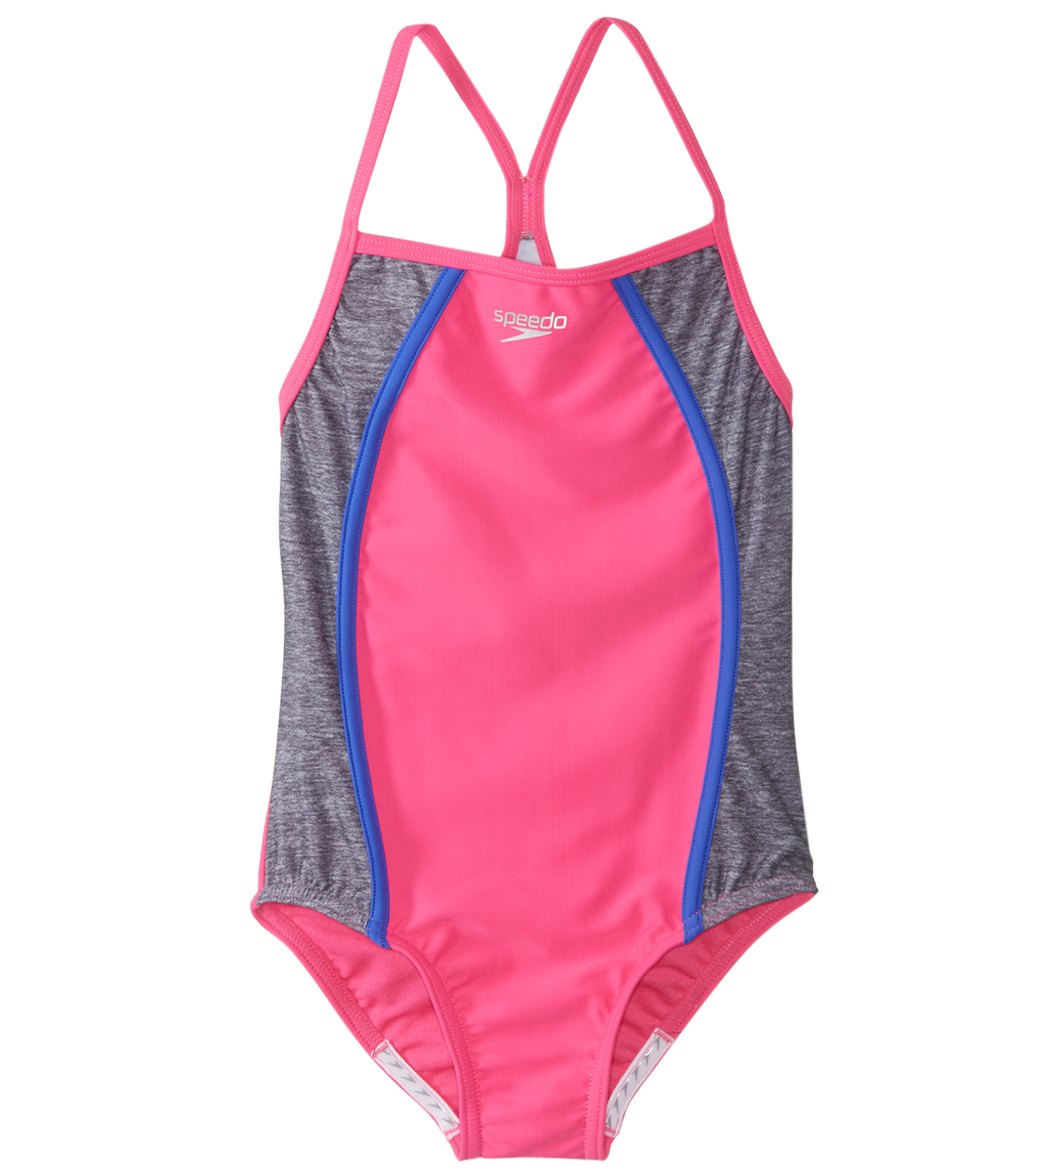 fd6a24675ed07 Speedo Girls' Heather Splice One Piece Swimsuit (7-16) at SwimOutlet.com